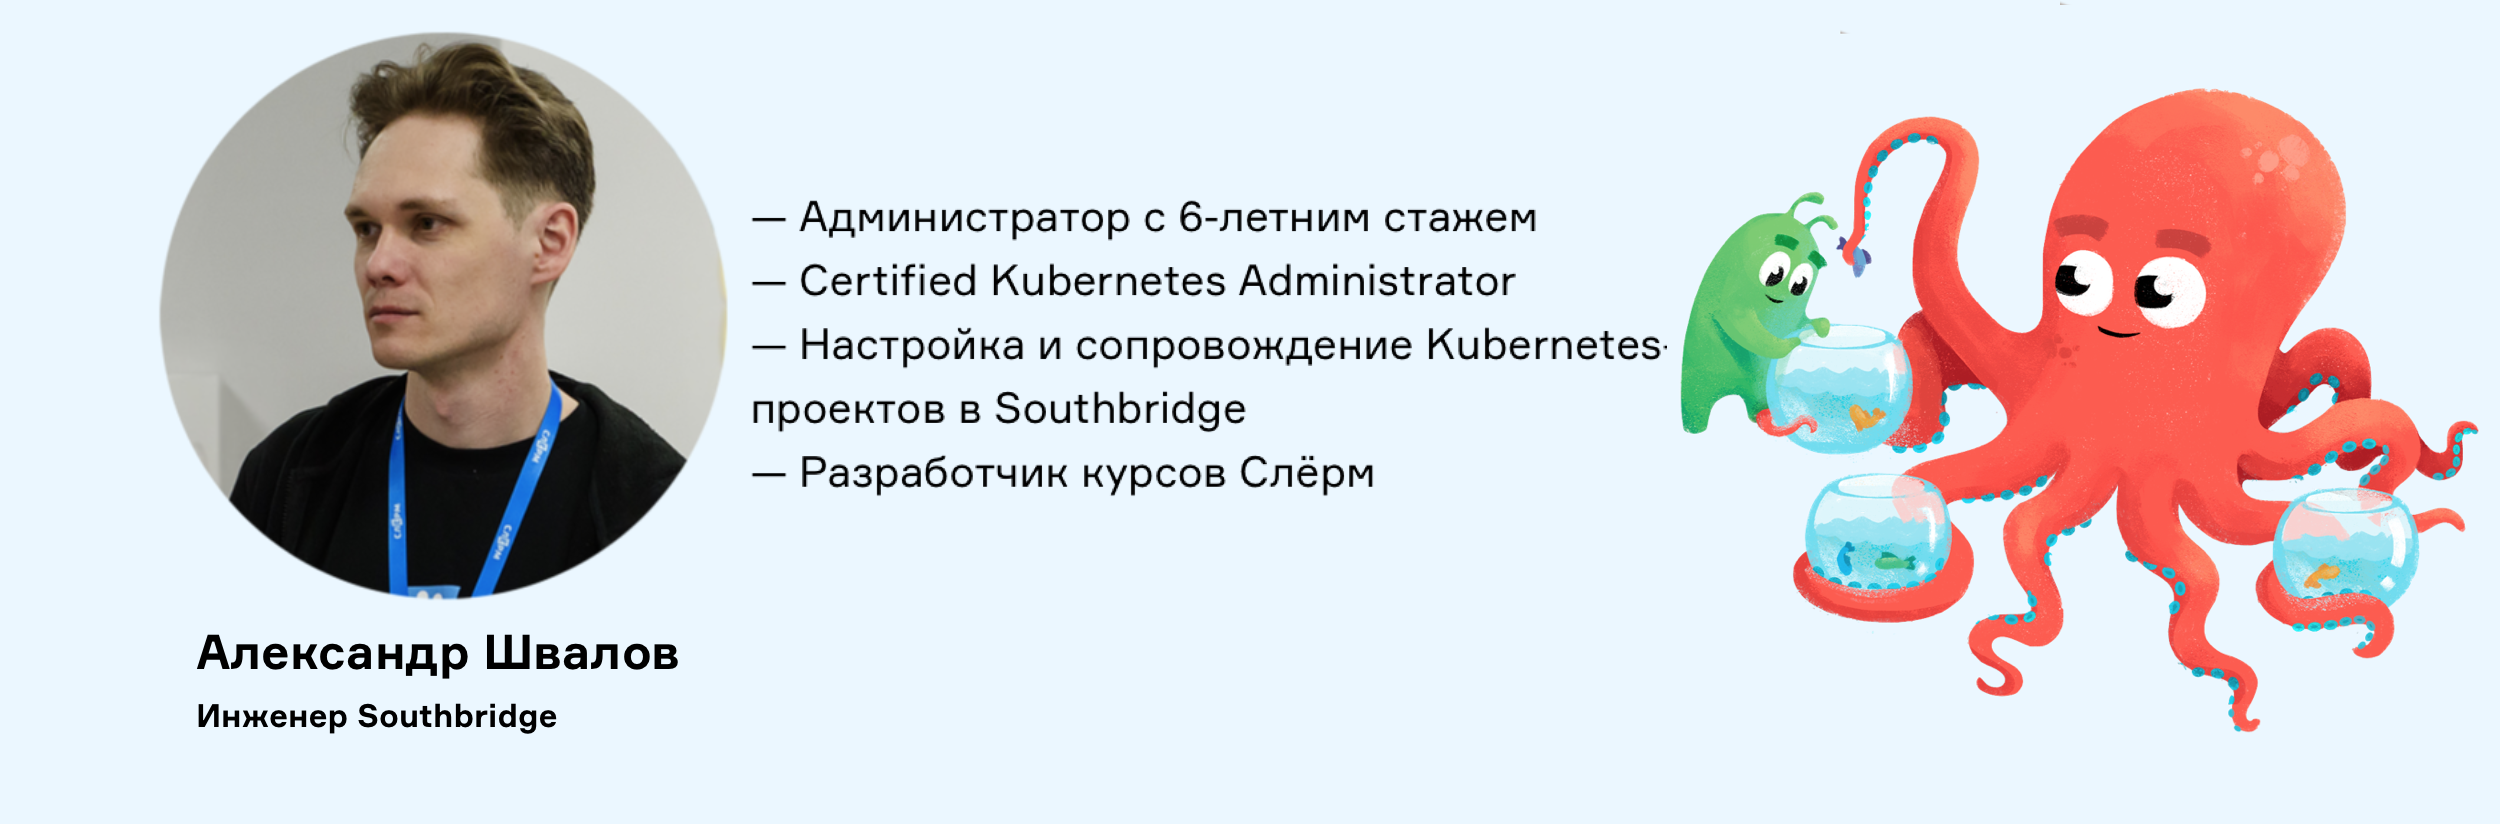 Практический пример подключения хранилища на базе Ceph в кластер Kubernetes